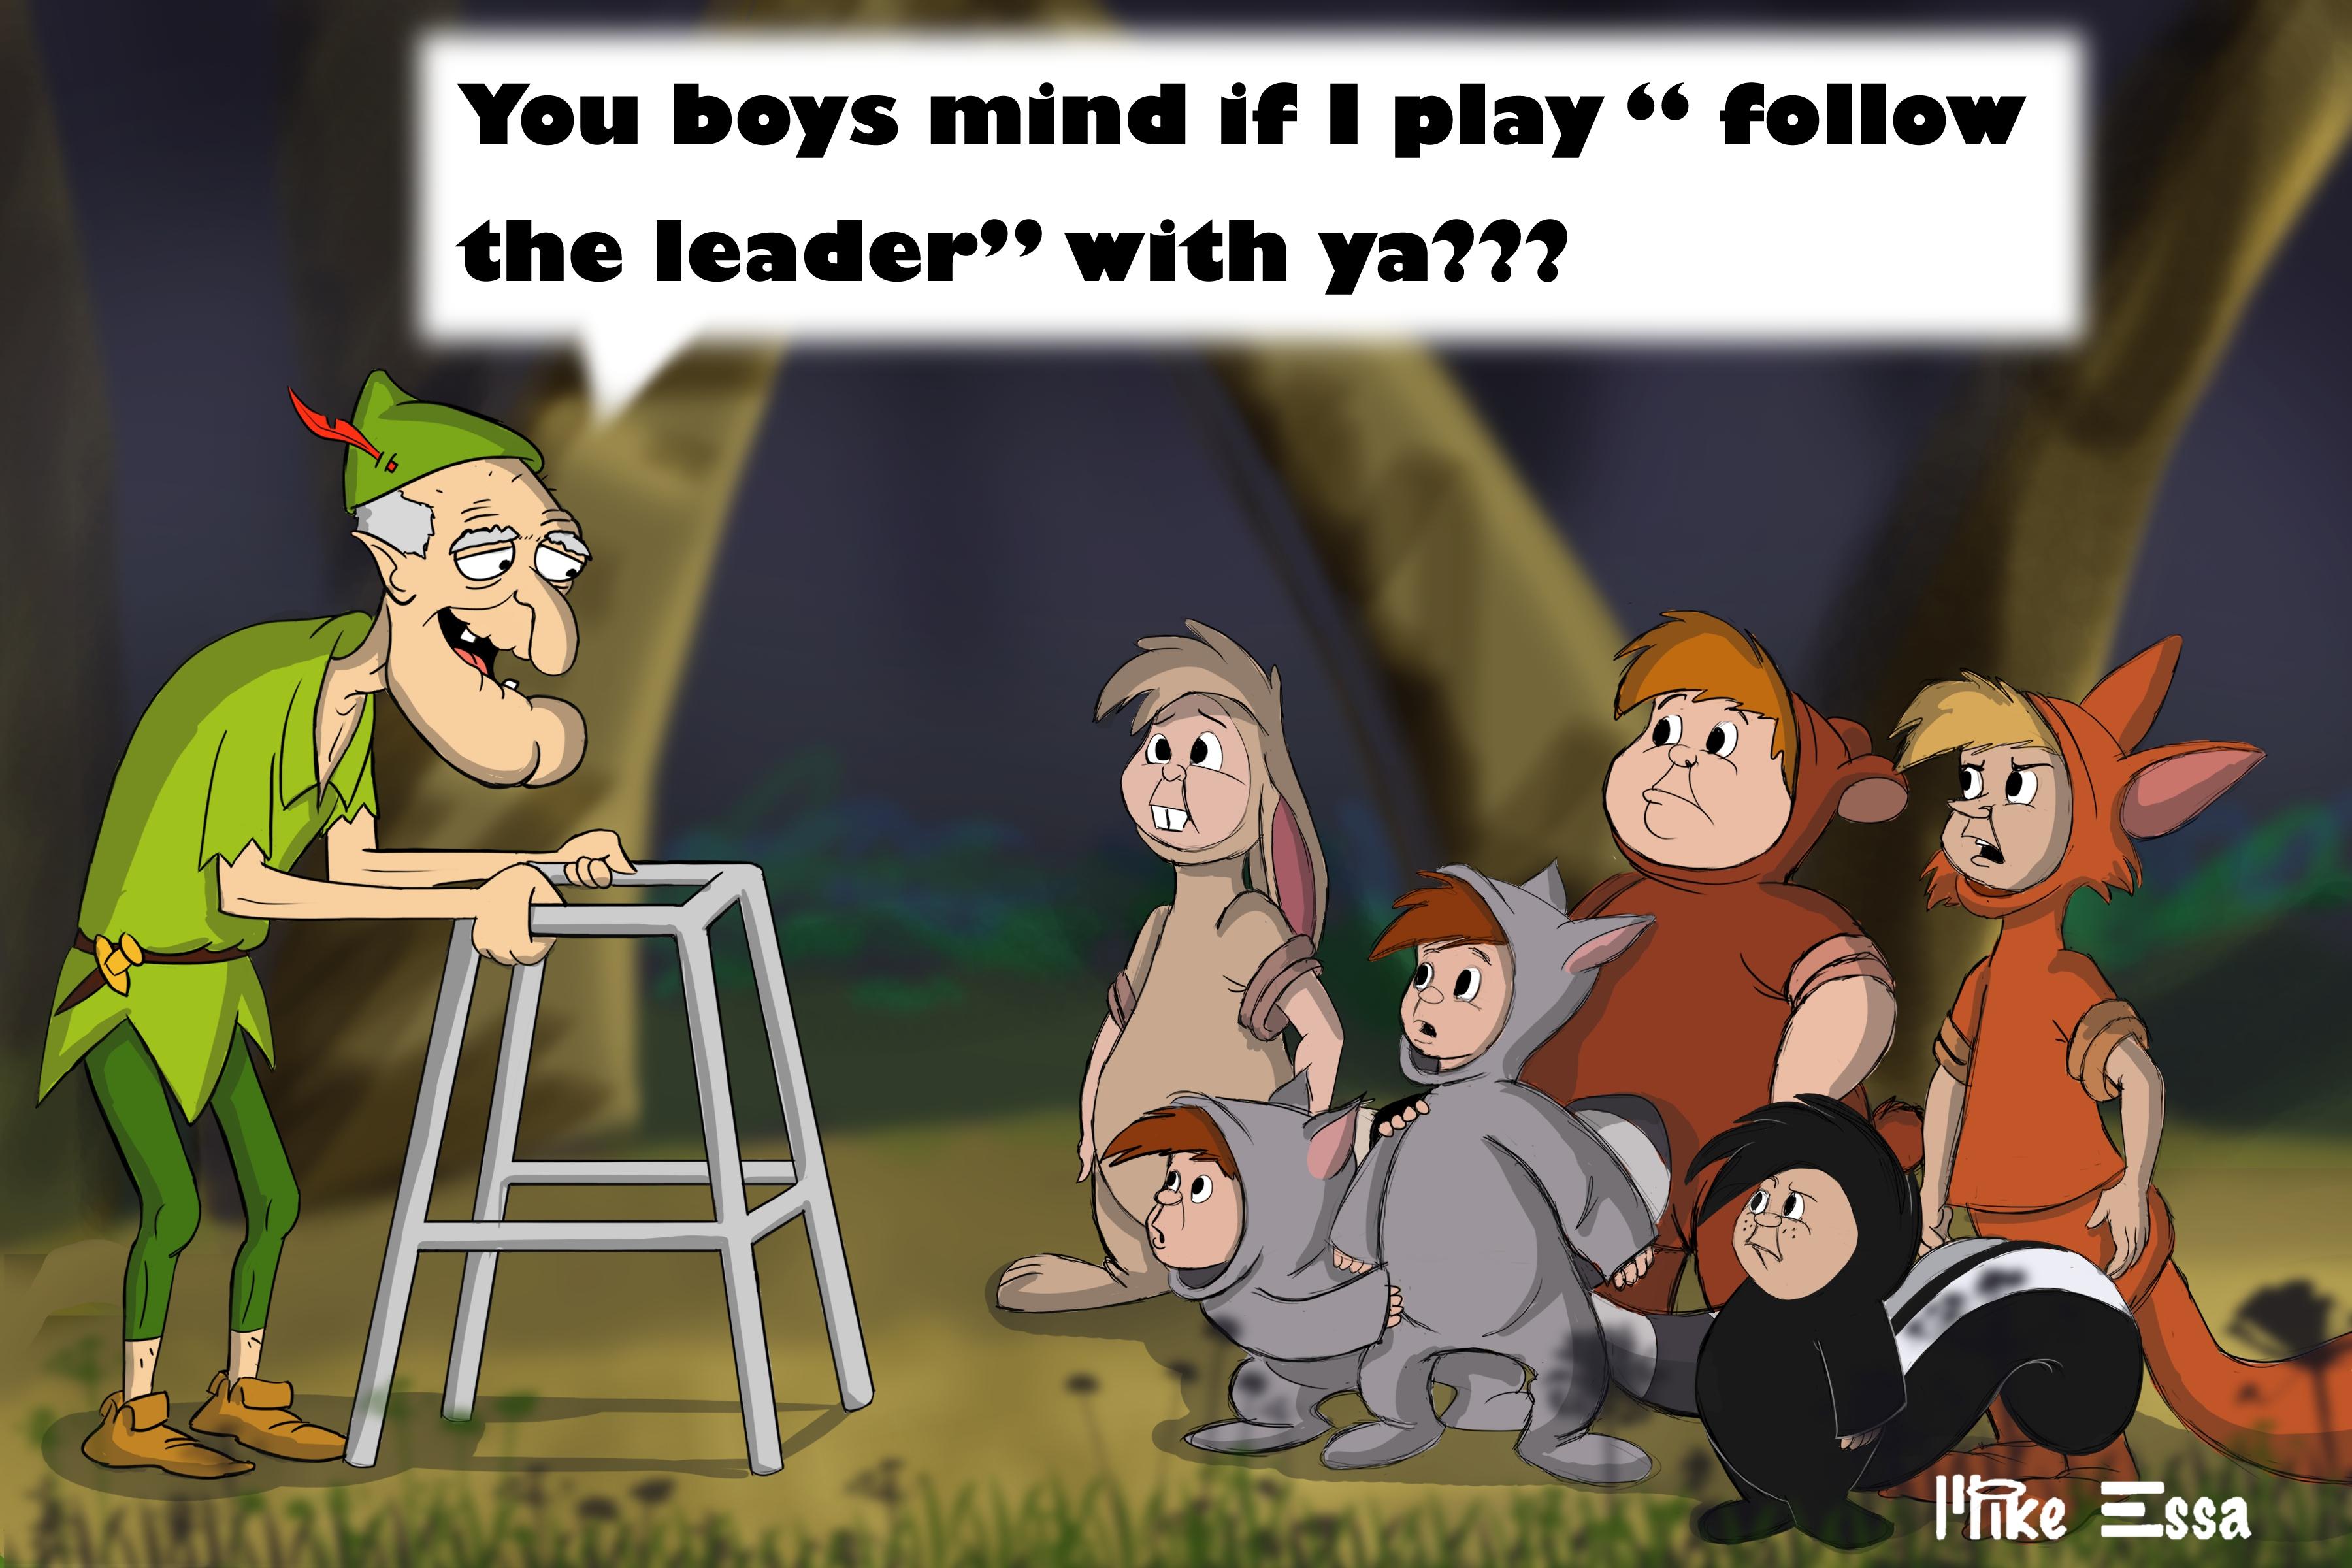 c77 image 282780] ruined childhood know your meme,Herbert Meme